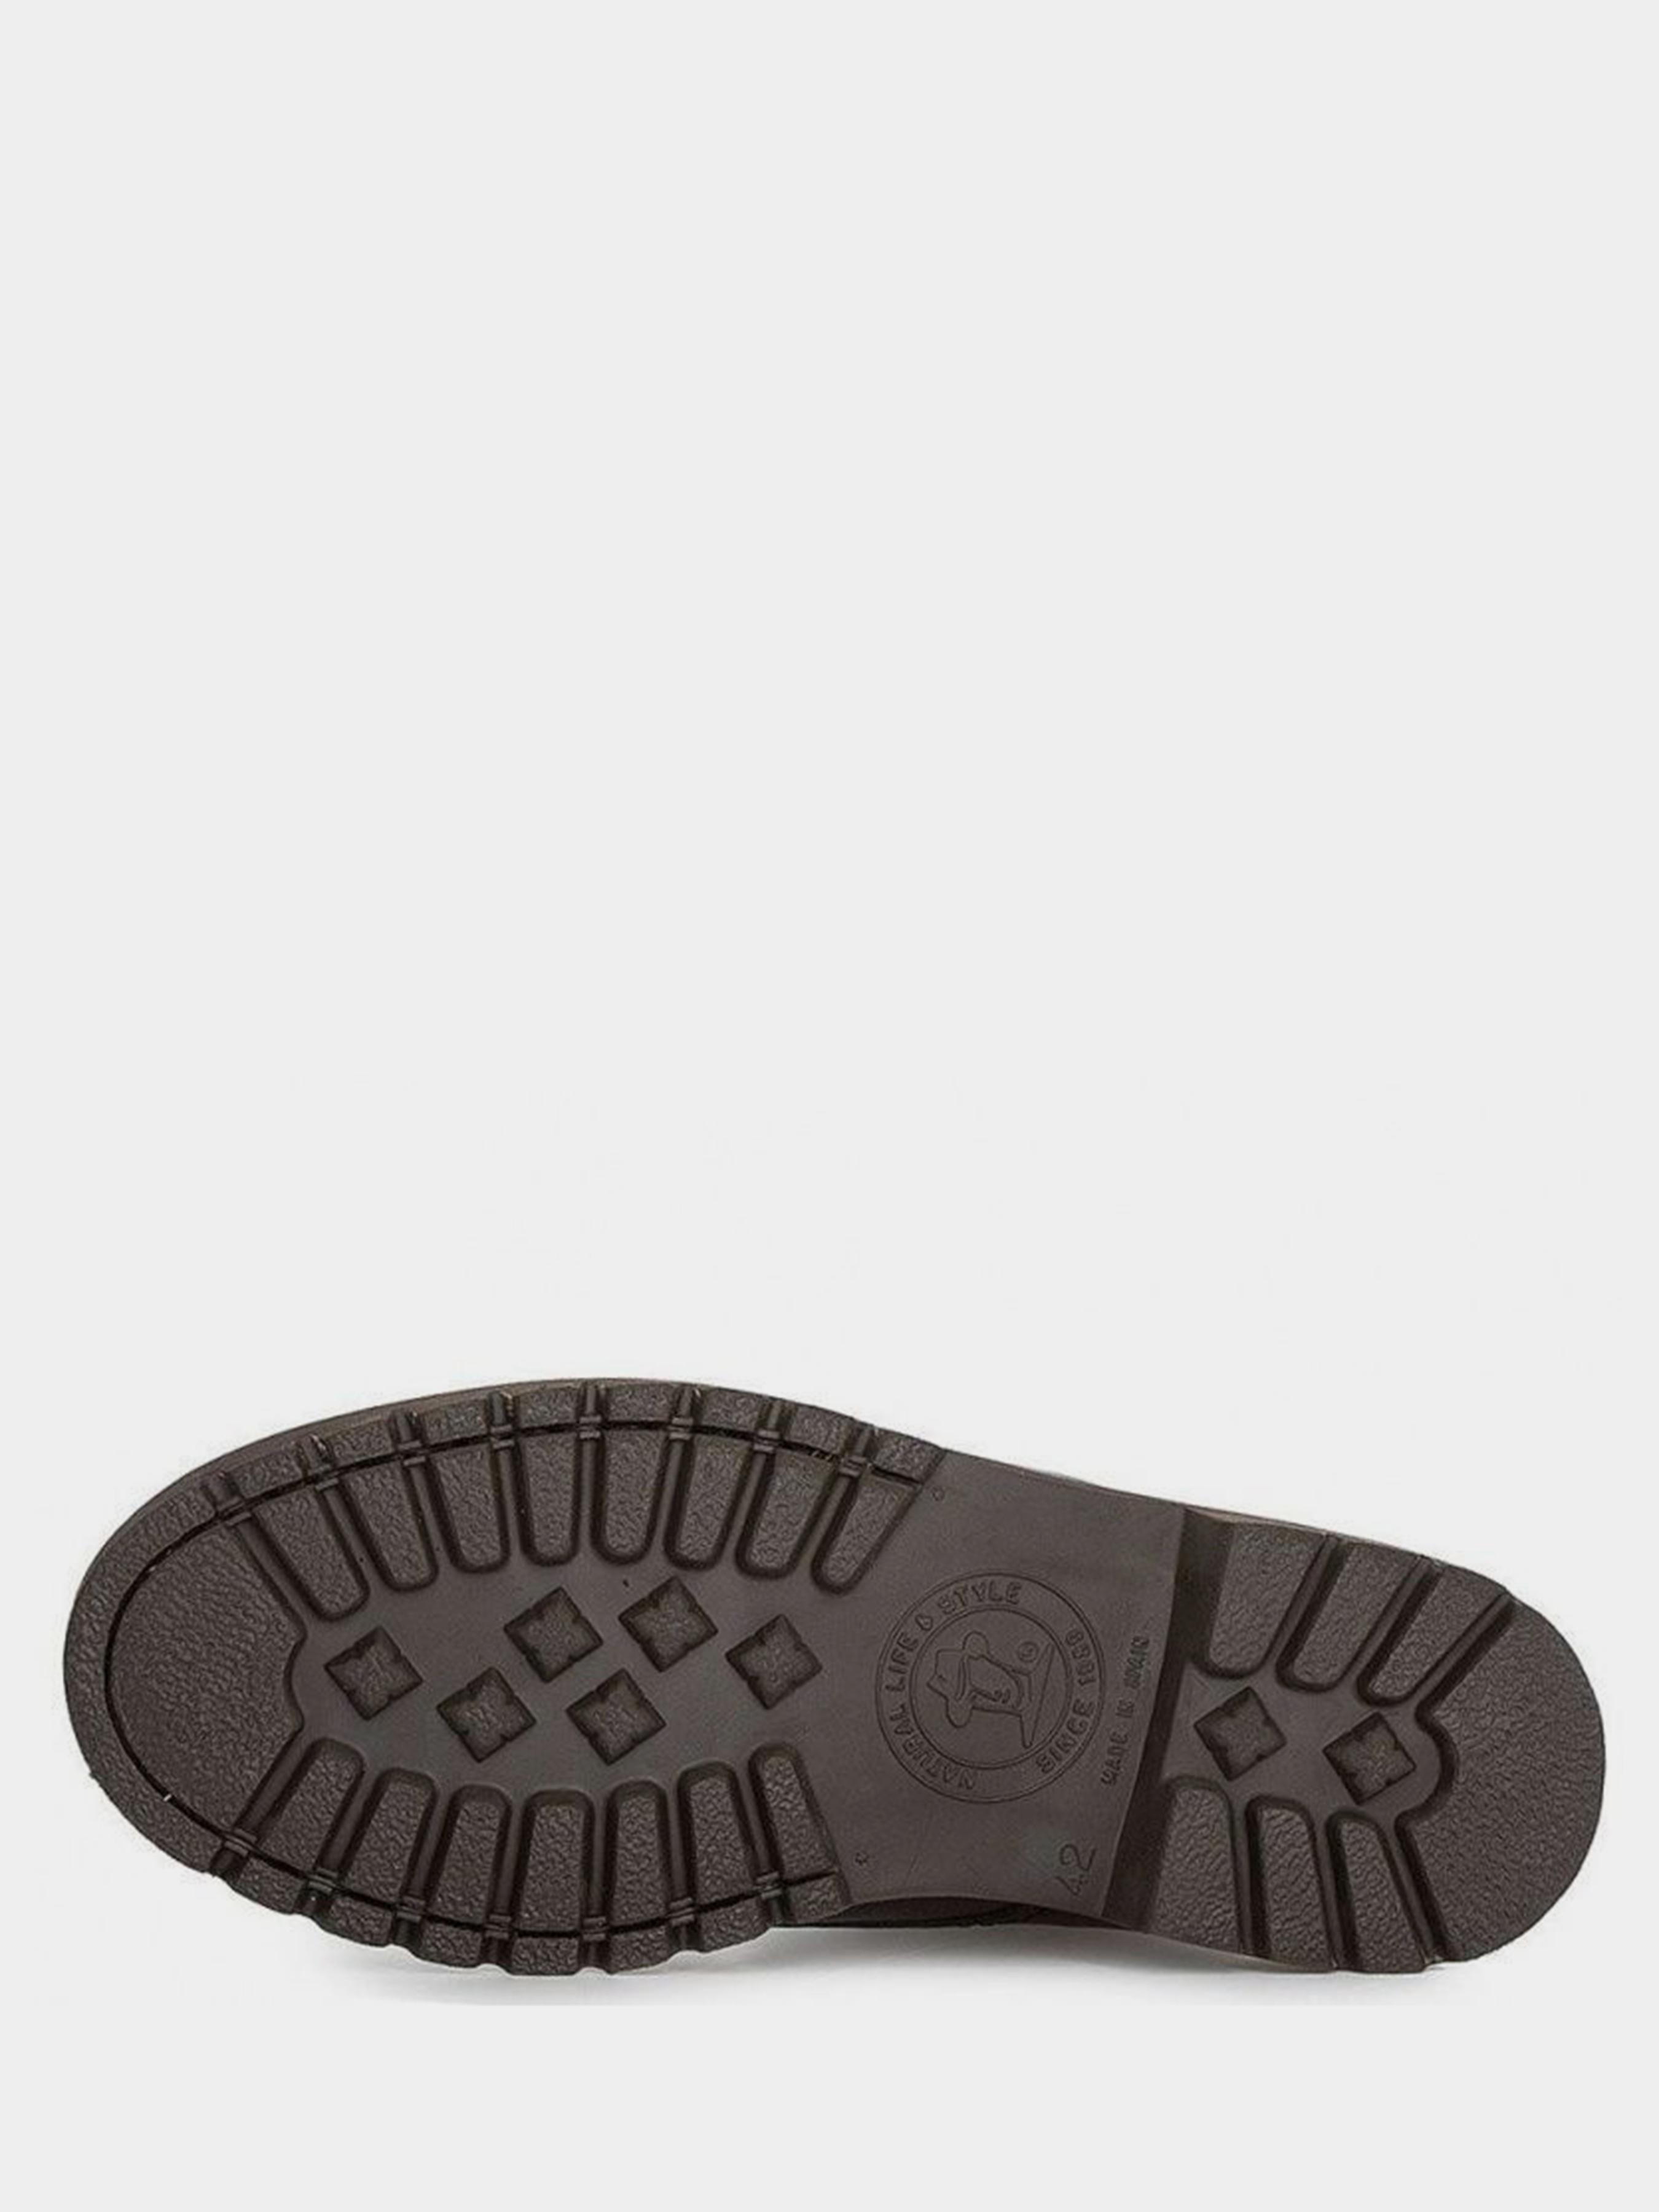 Ботинки для мужчин Panama Jack PX72 стоимость, 2017